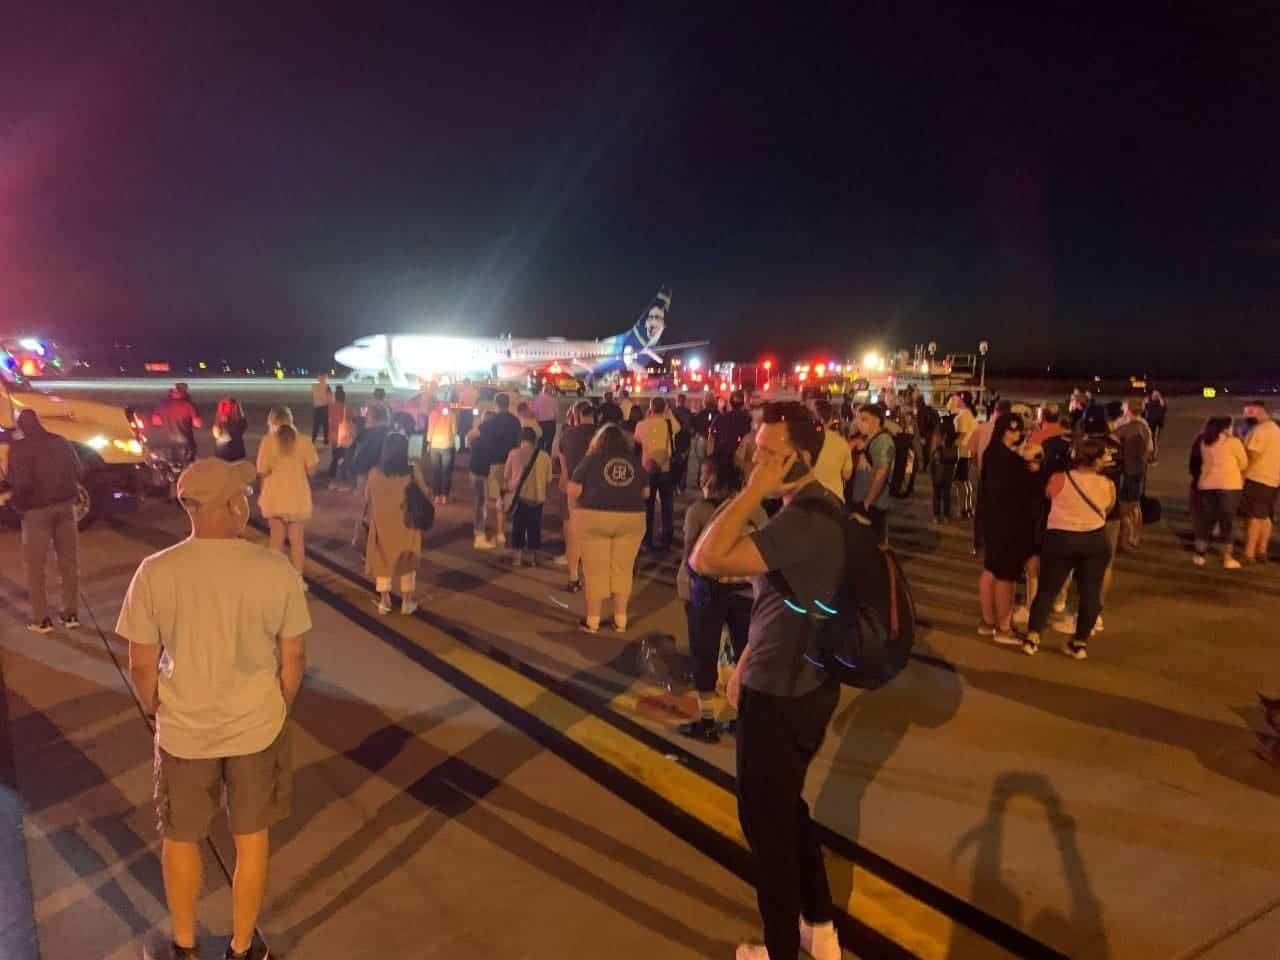 Samsung Smartphone explodes in plane